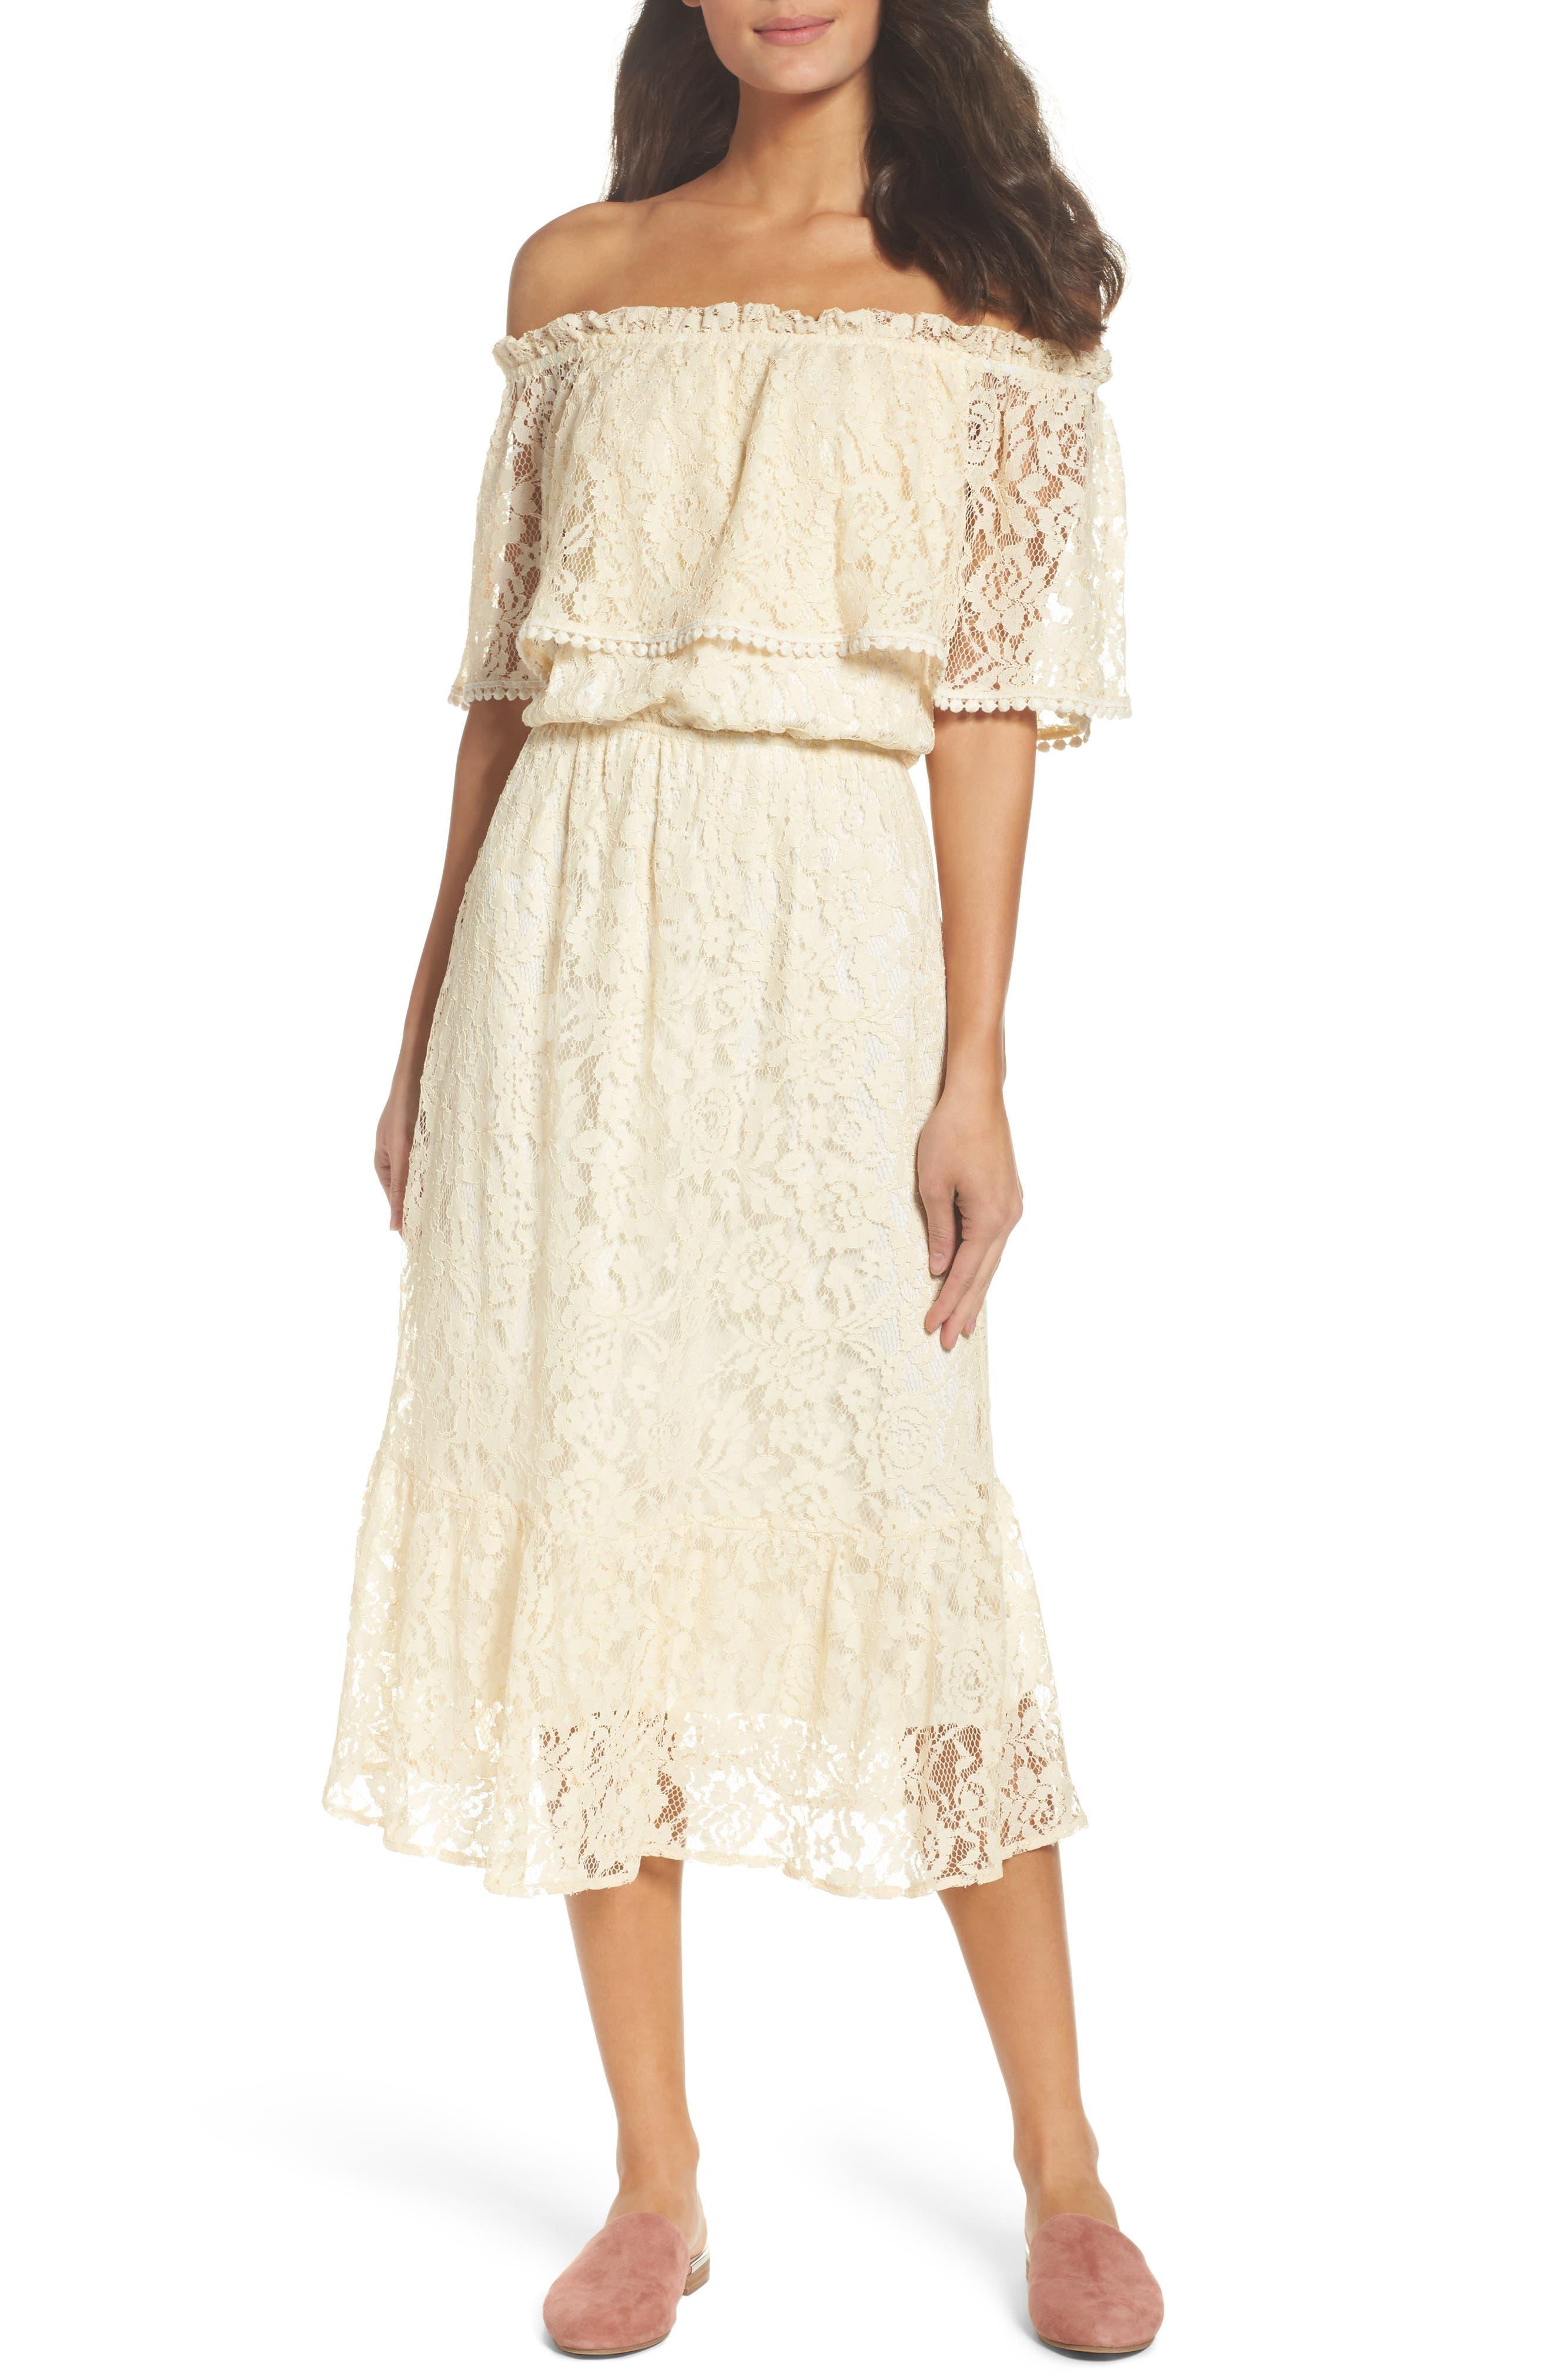 Alternate Image 1 Selected - Fraiche by J Popover Midi Dress